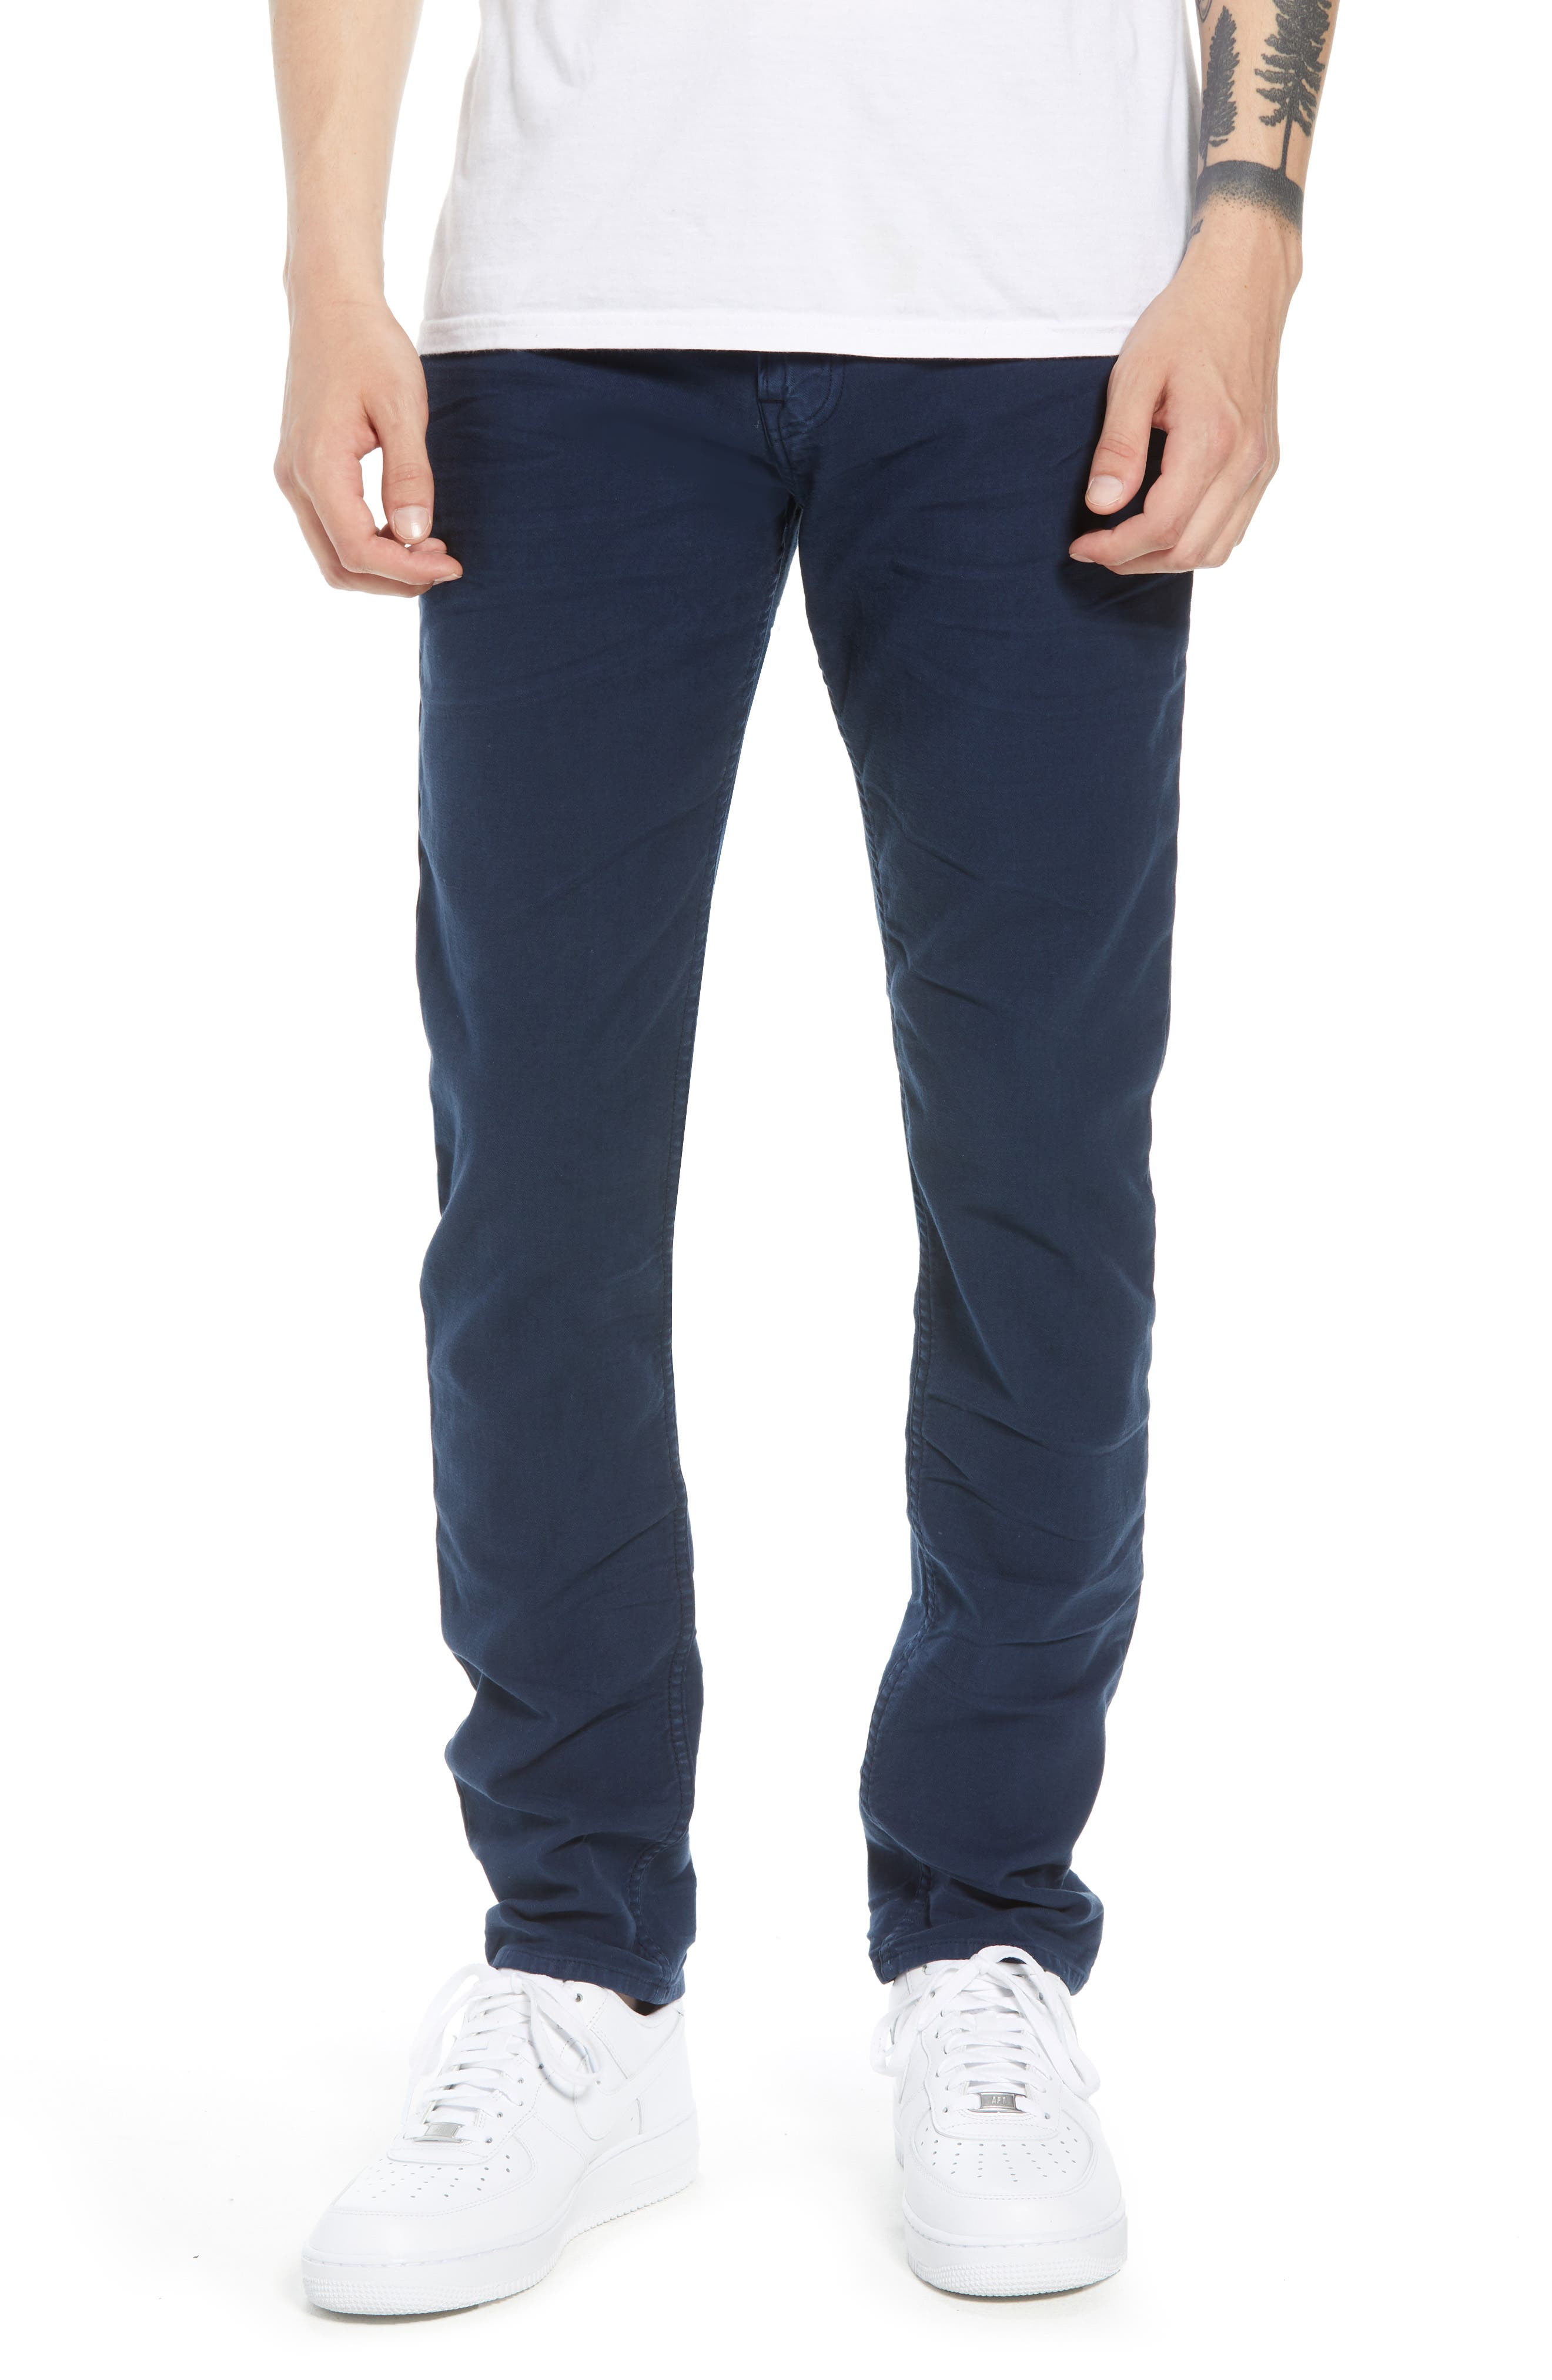 Hudson Axl Skinny Fit Jeans,                         Main,                         color, SAILOR BLUE